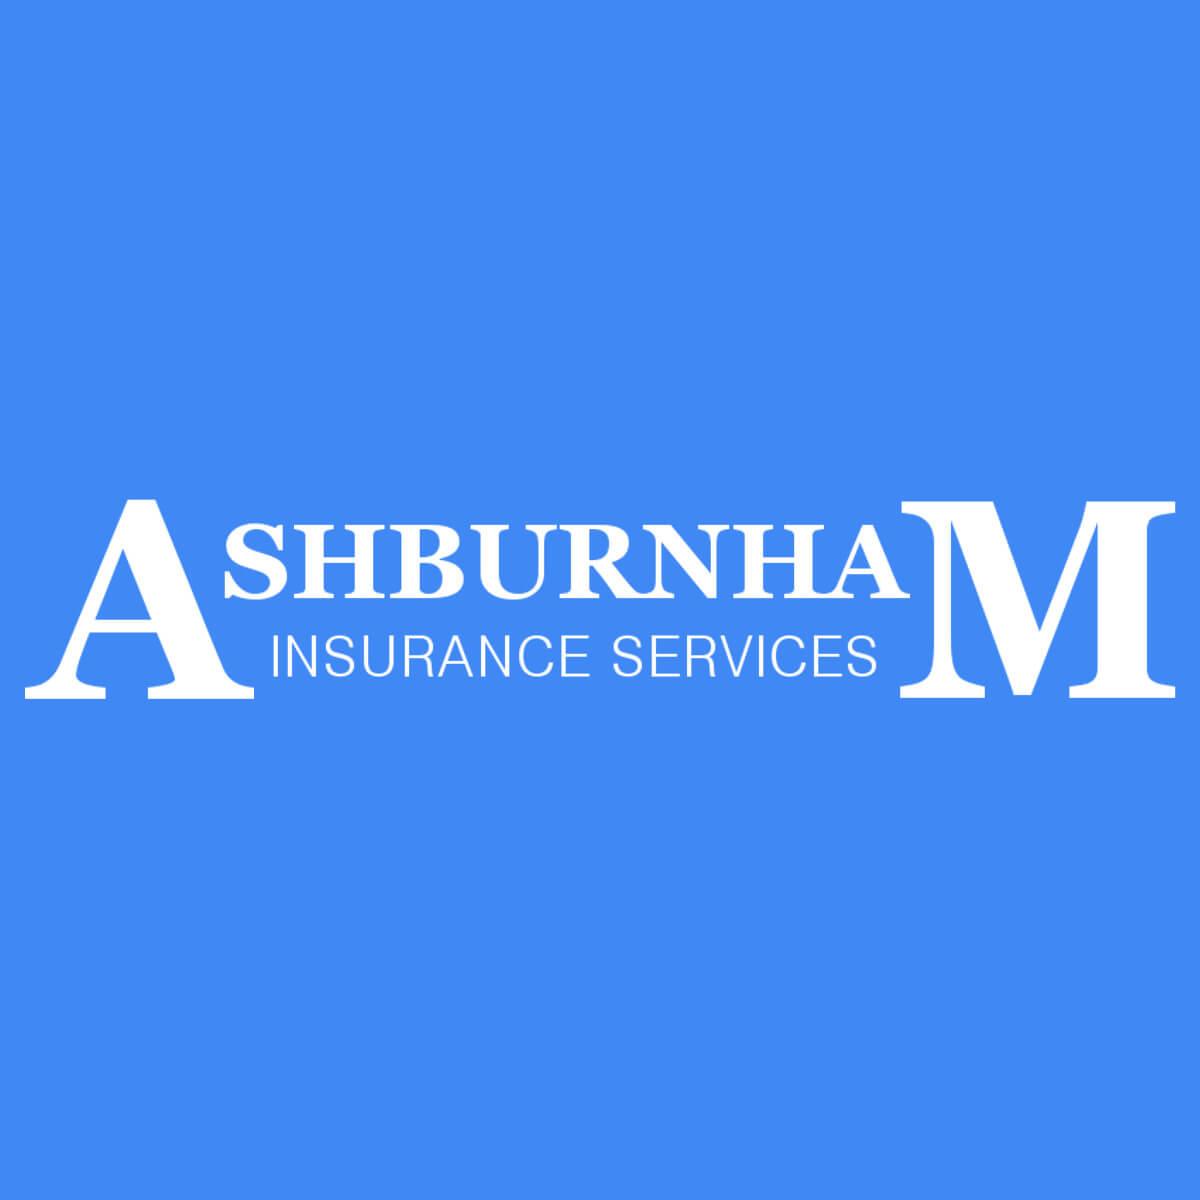 (c) Ashburnham-insurance.co.uk